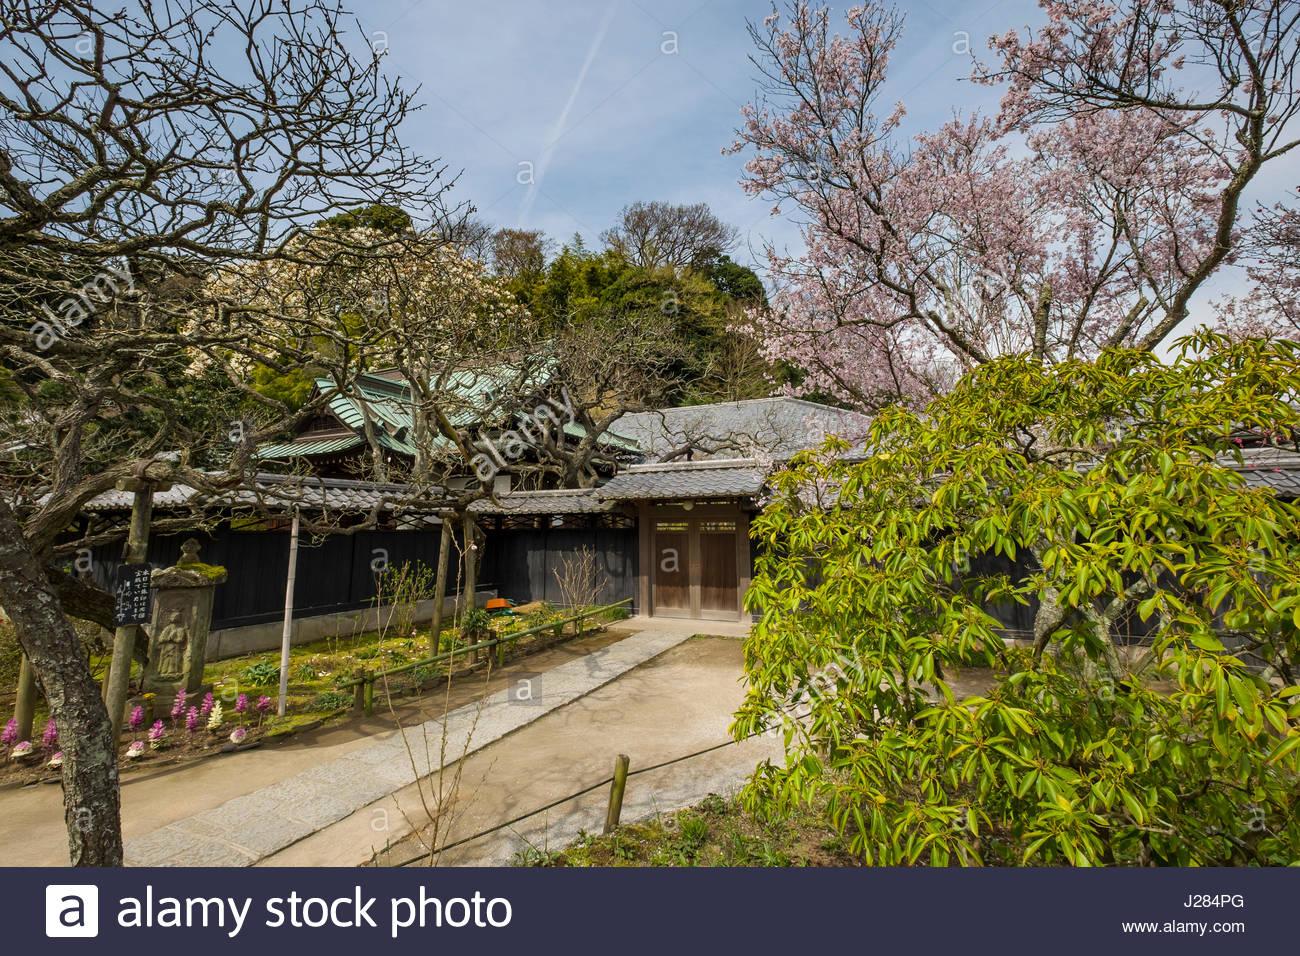 Shōkozan Tōkei-ji Buddhist temple and a former nunnery, Yamanouchi, Kamakura, Kanagawa Prefecture, Honshu, Japan - Stock Image